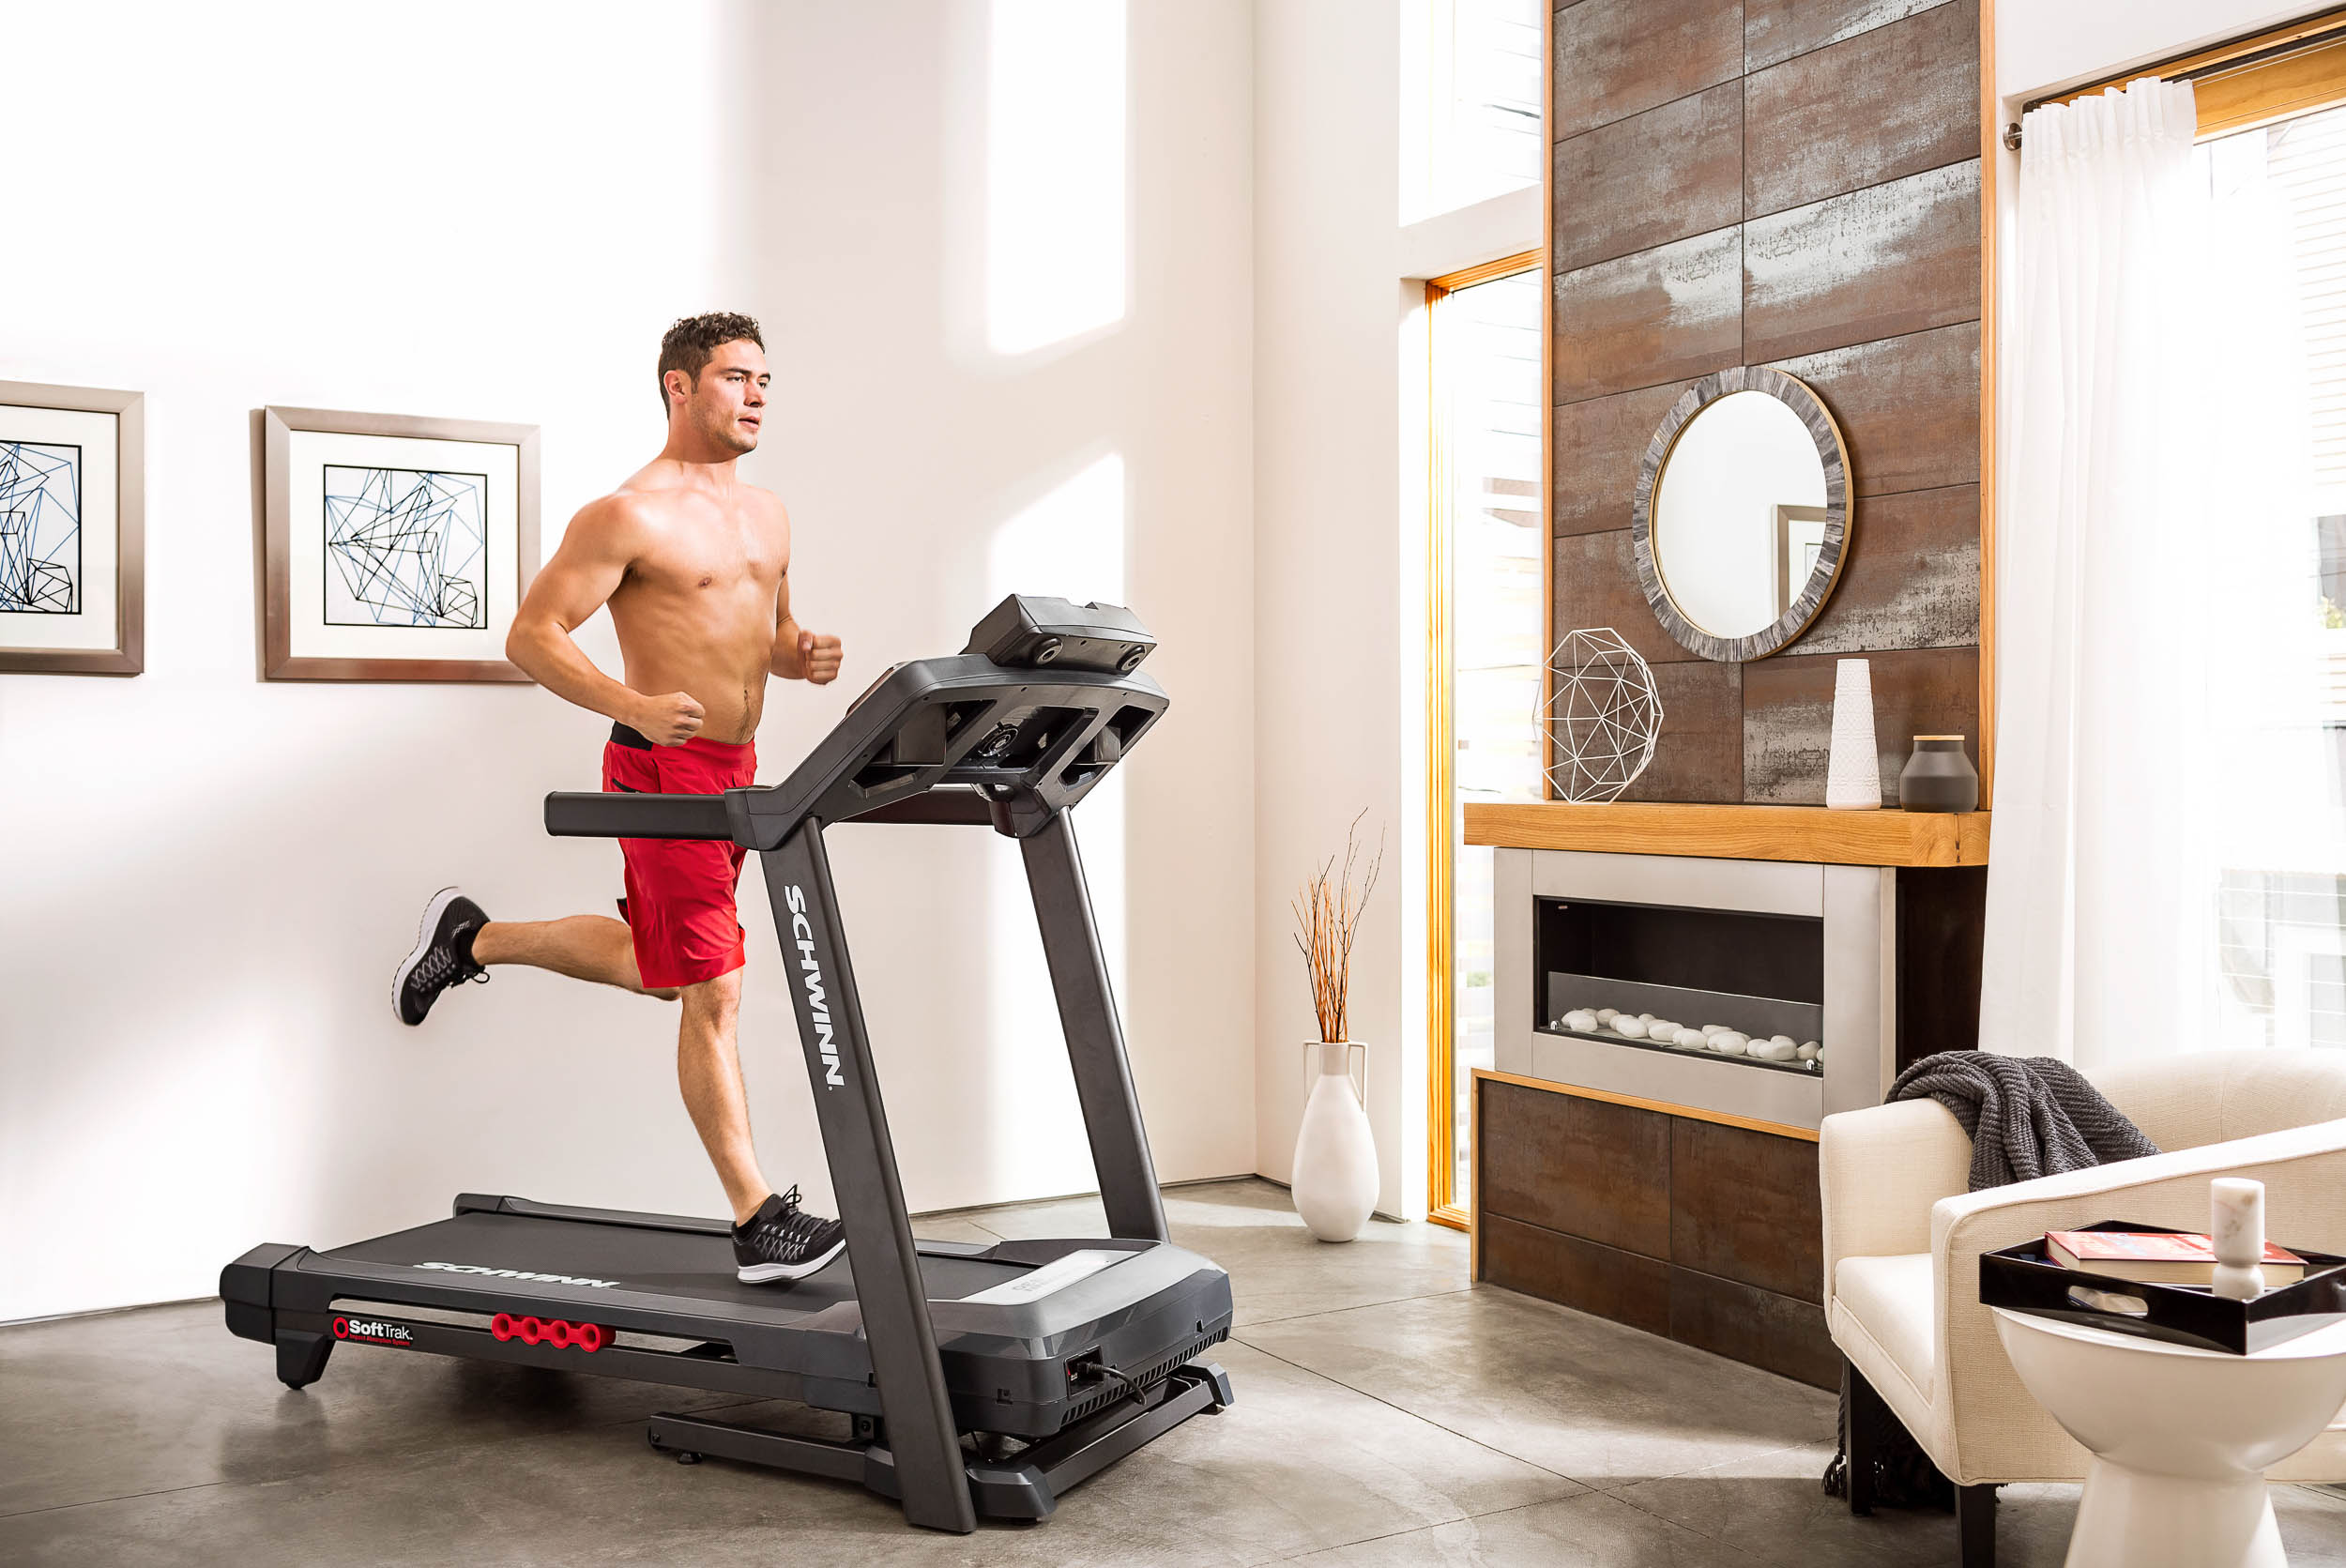 Nautilus_Direct_116099_Schwinn Treadmill T830 Front 3-4 Clay_1603 copy.jpg